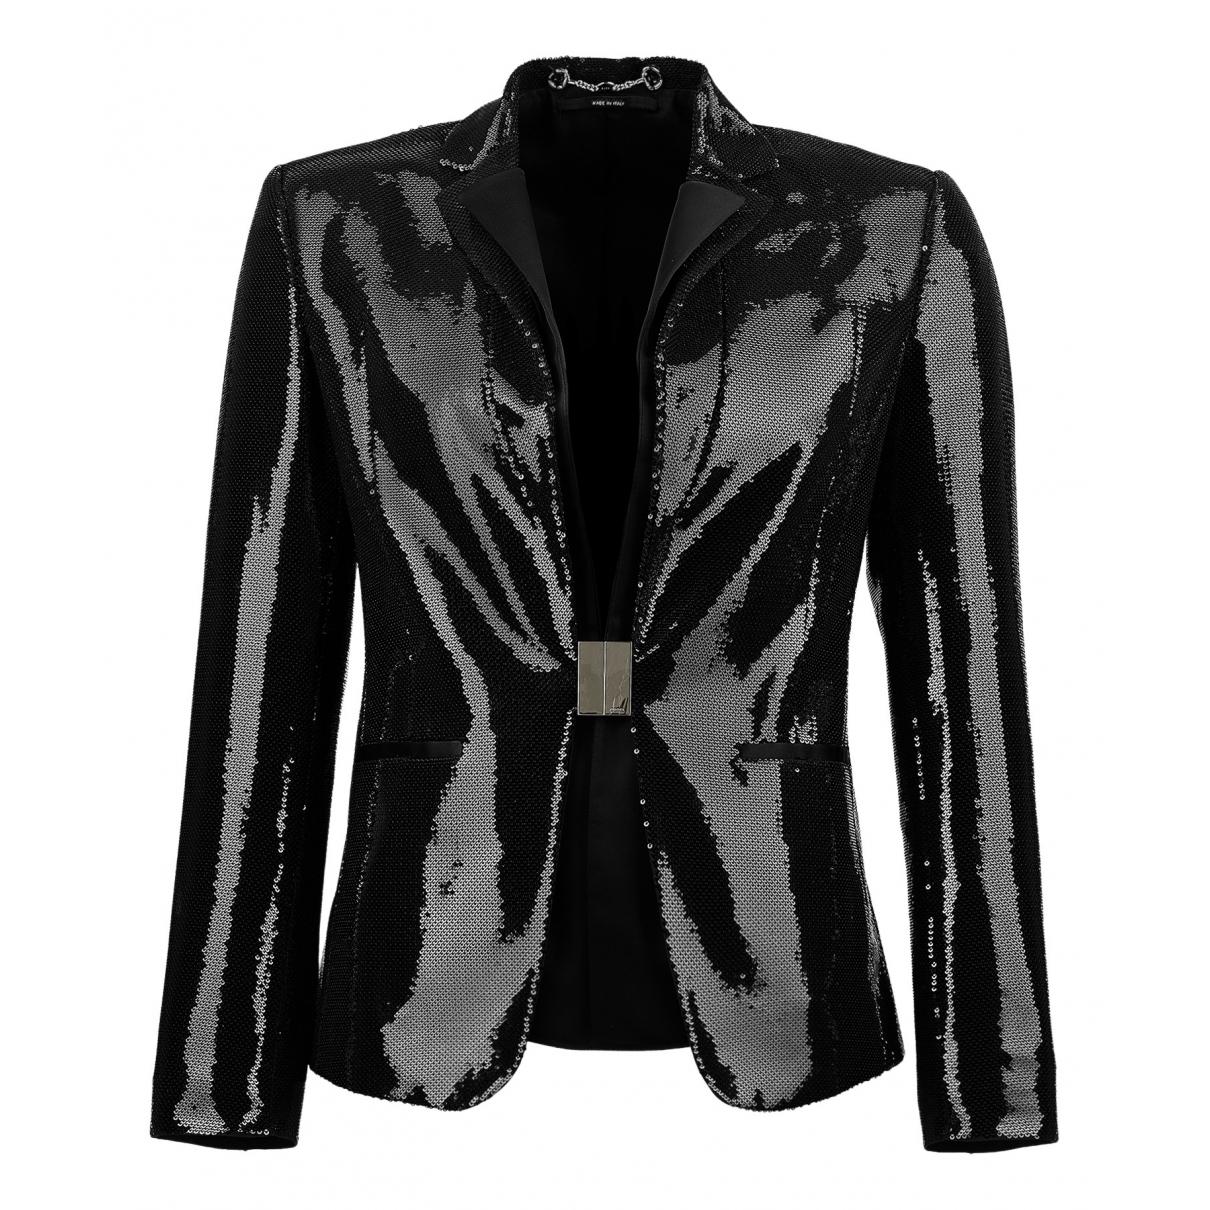 Gucci N Black jacket for Women 10 UK